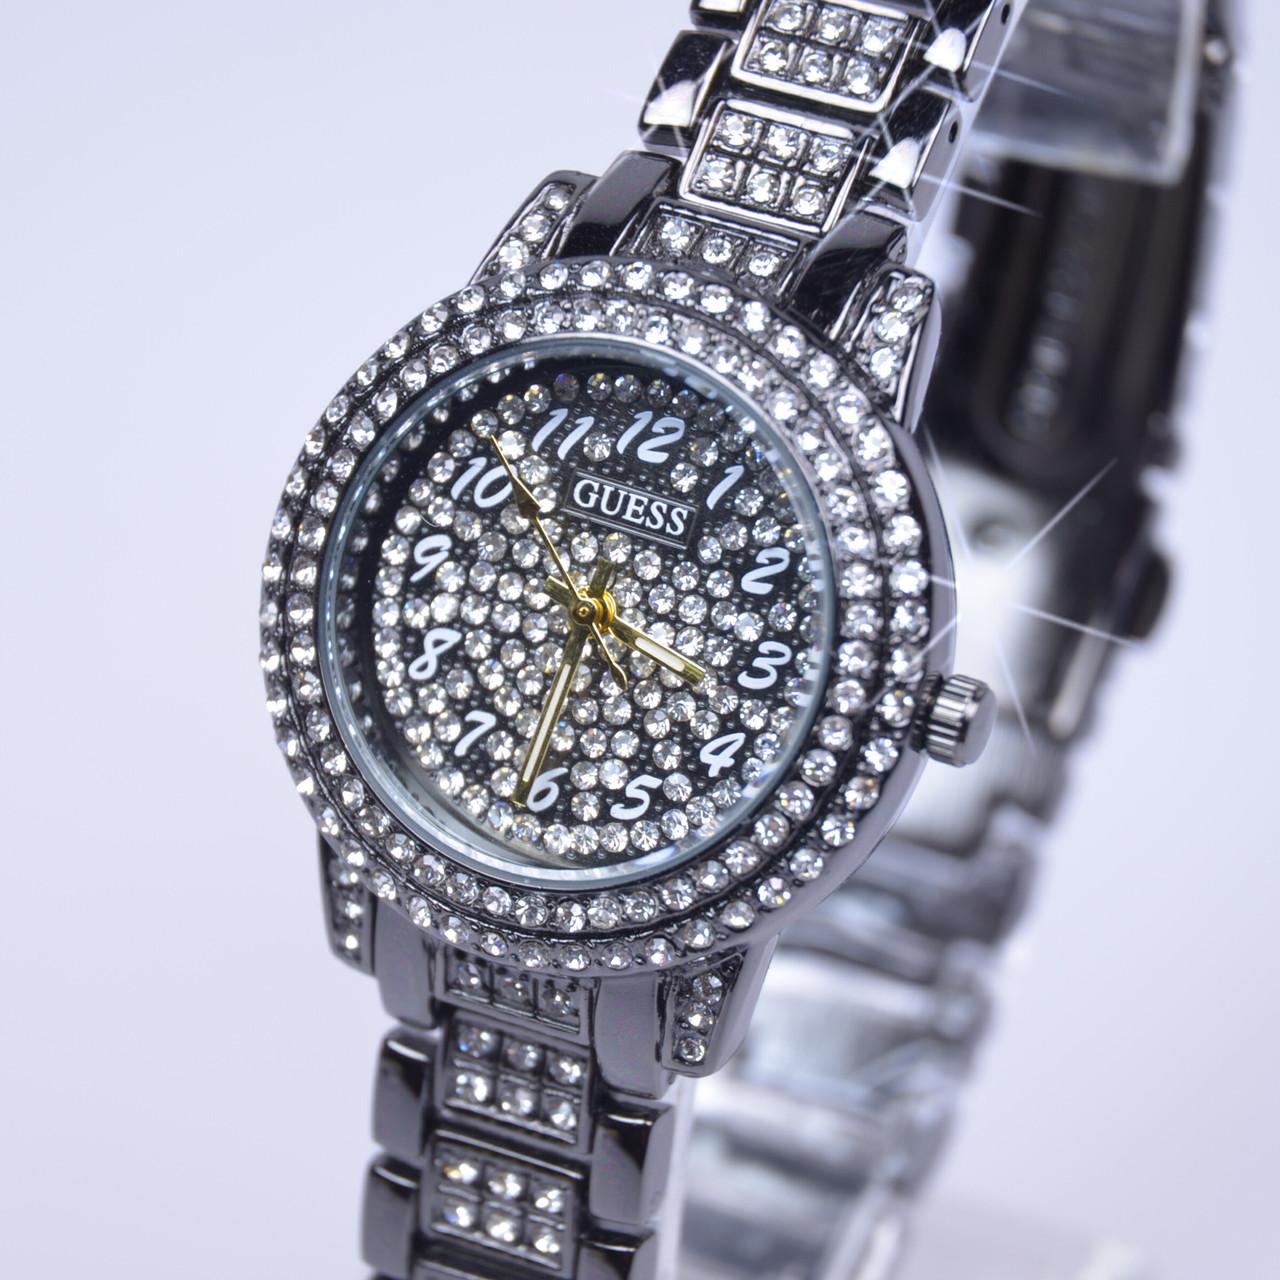 Женские наручные часы GUESS кварц